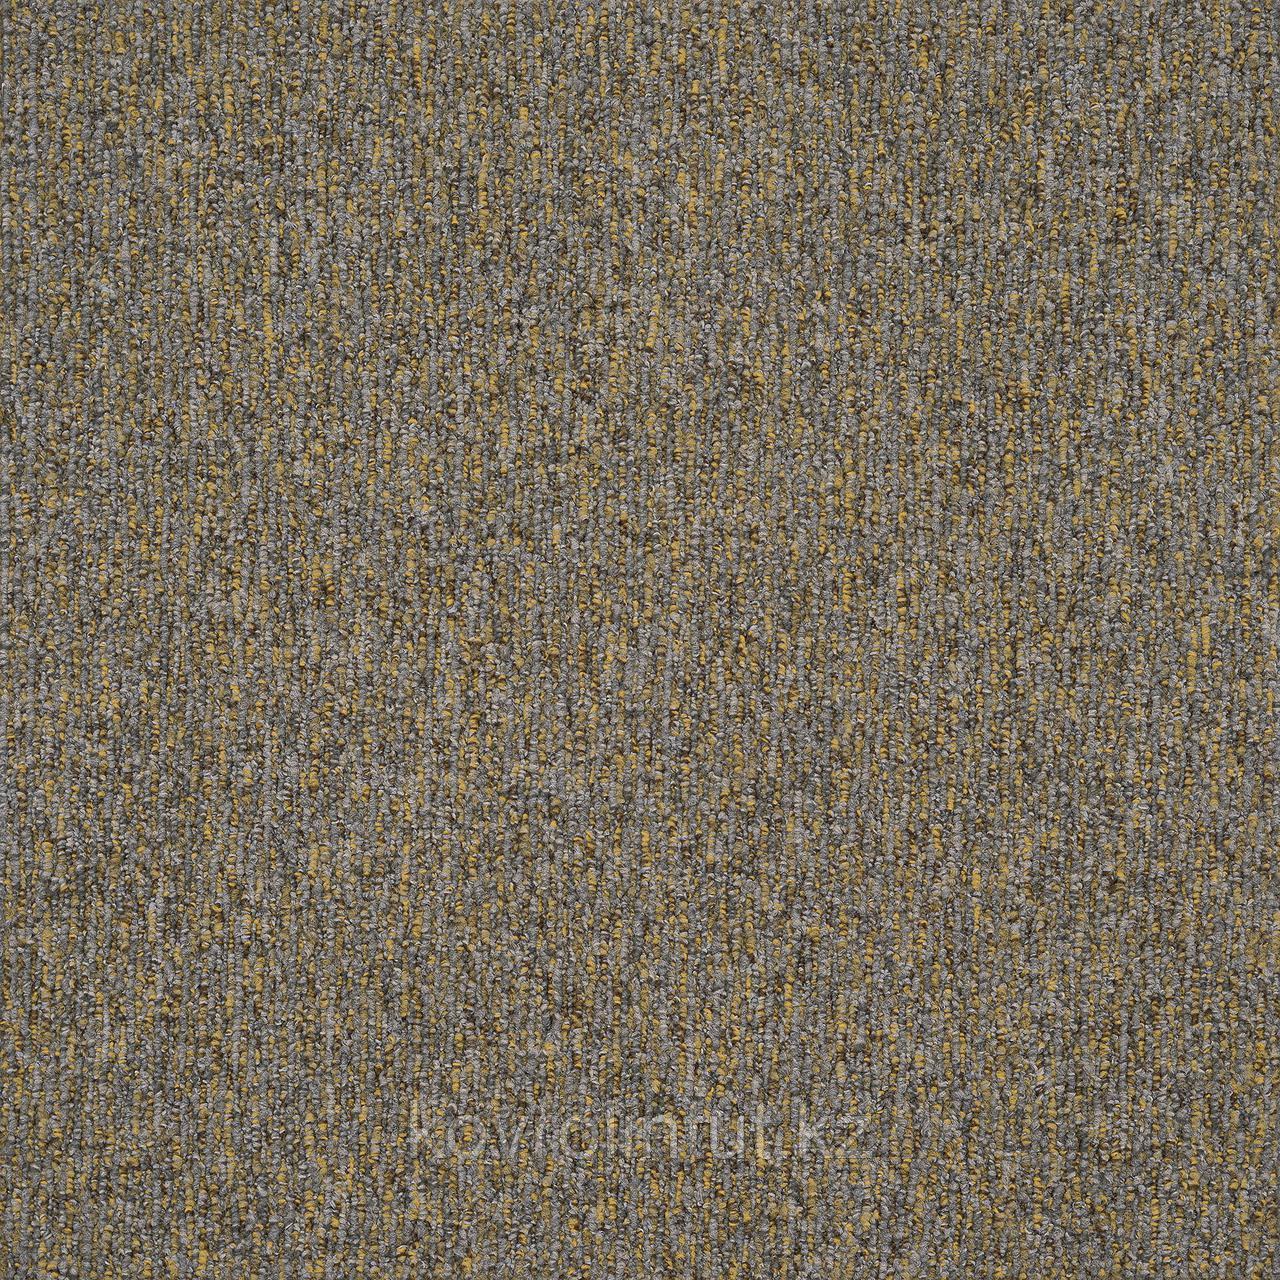 Ковровая плитка с КМ2 Galaxy Star Tarkett (Таркетт) 93587